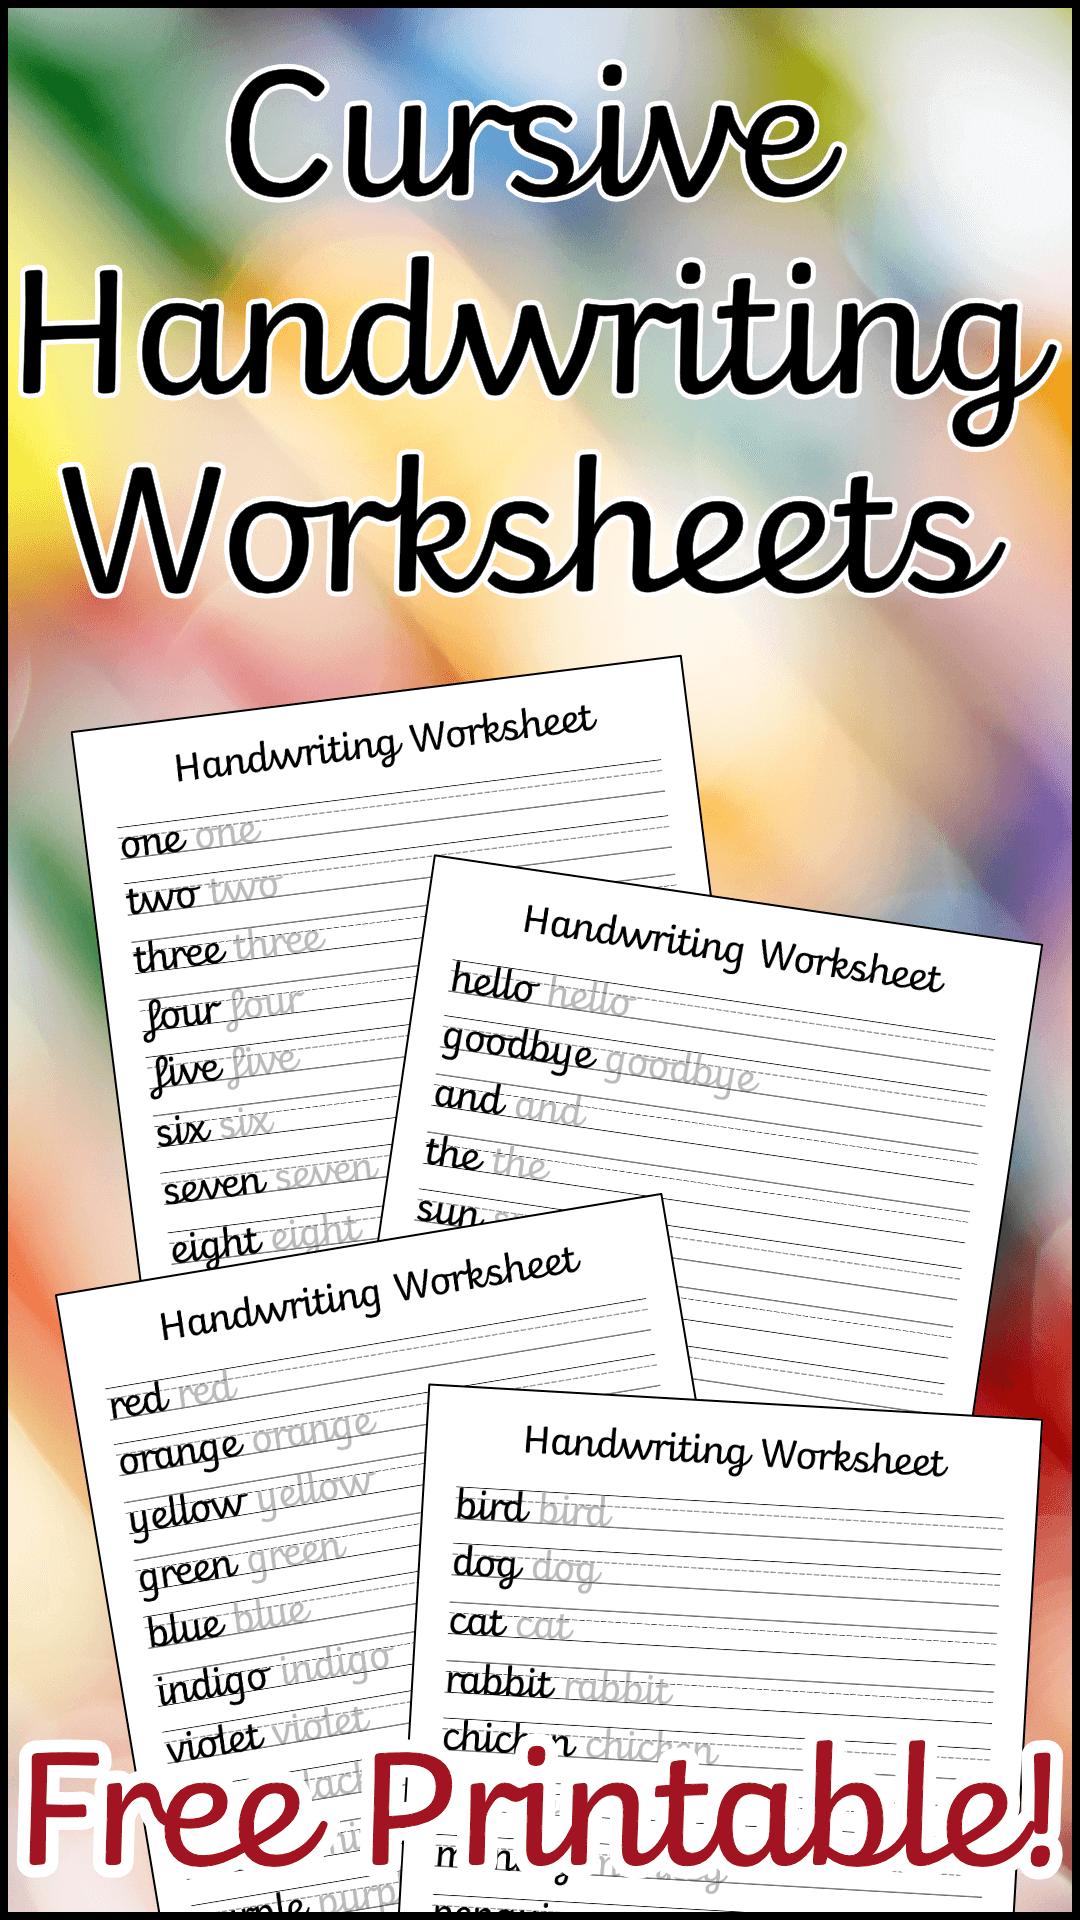 Cursive Handwriting Worksheets Free Printable In